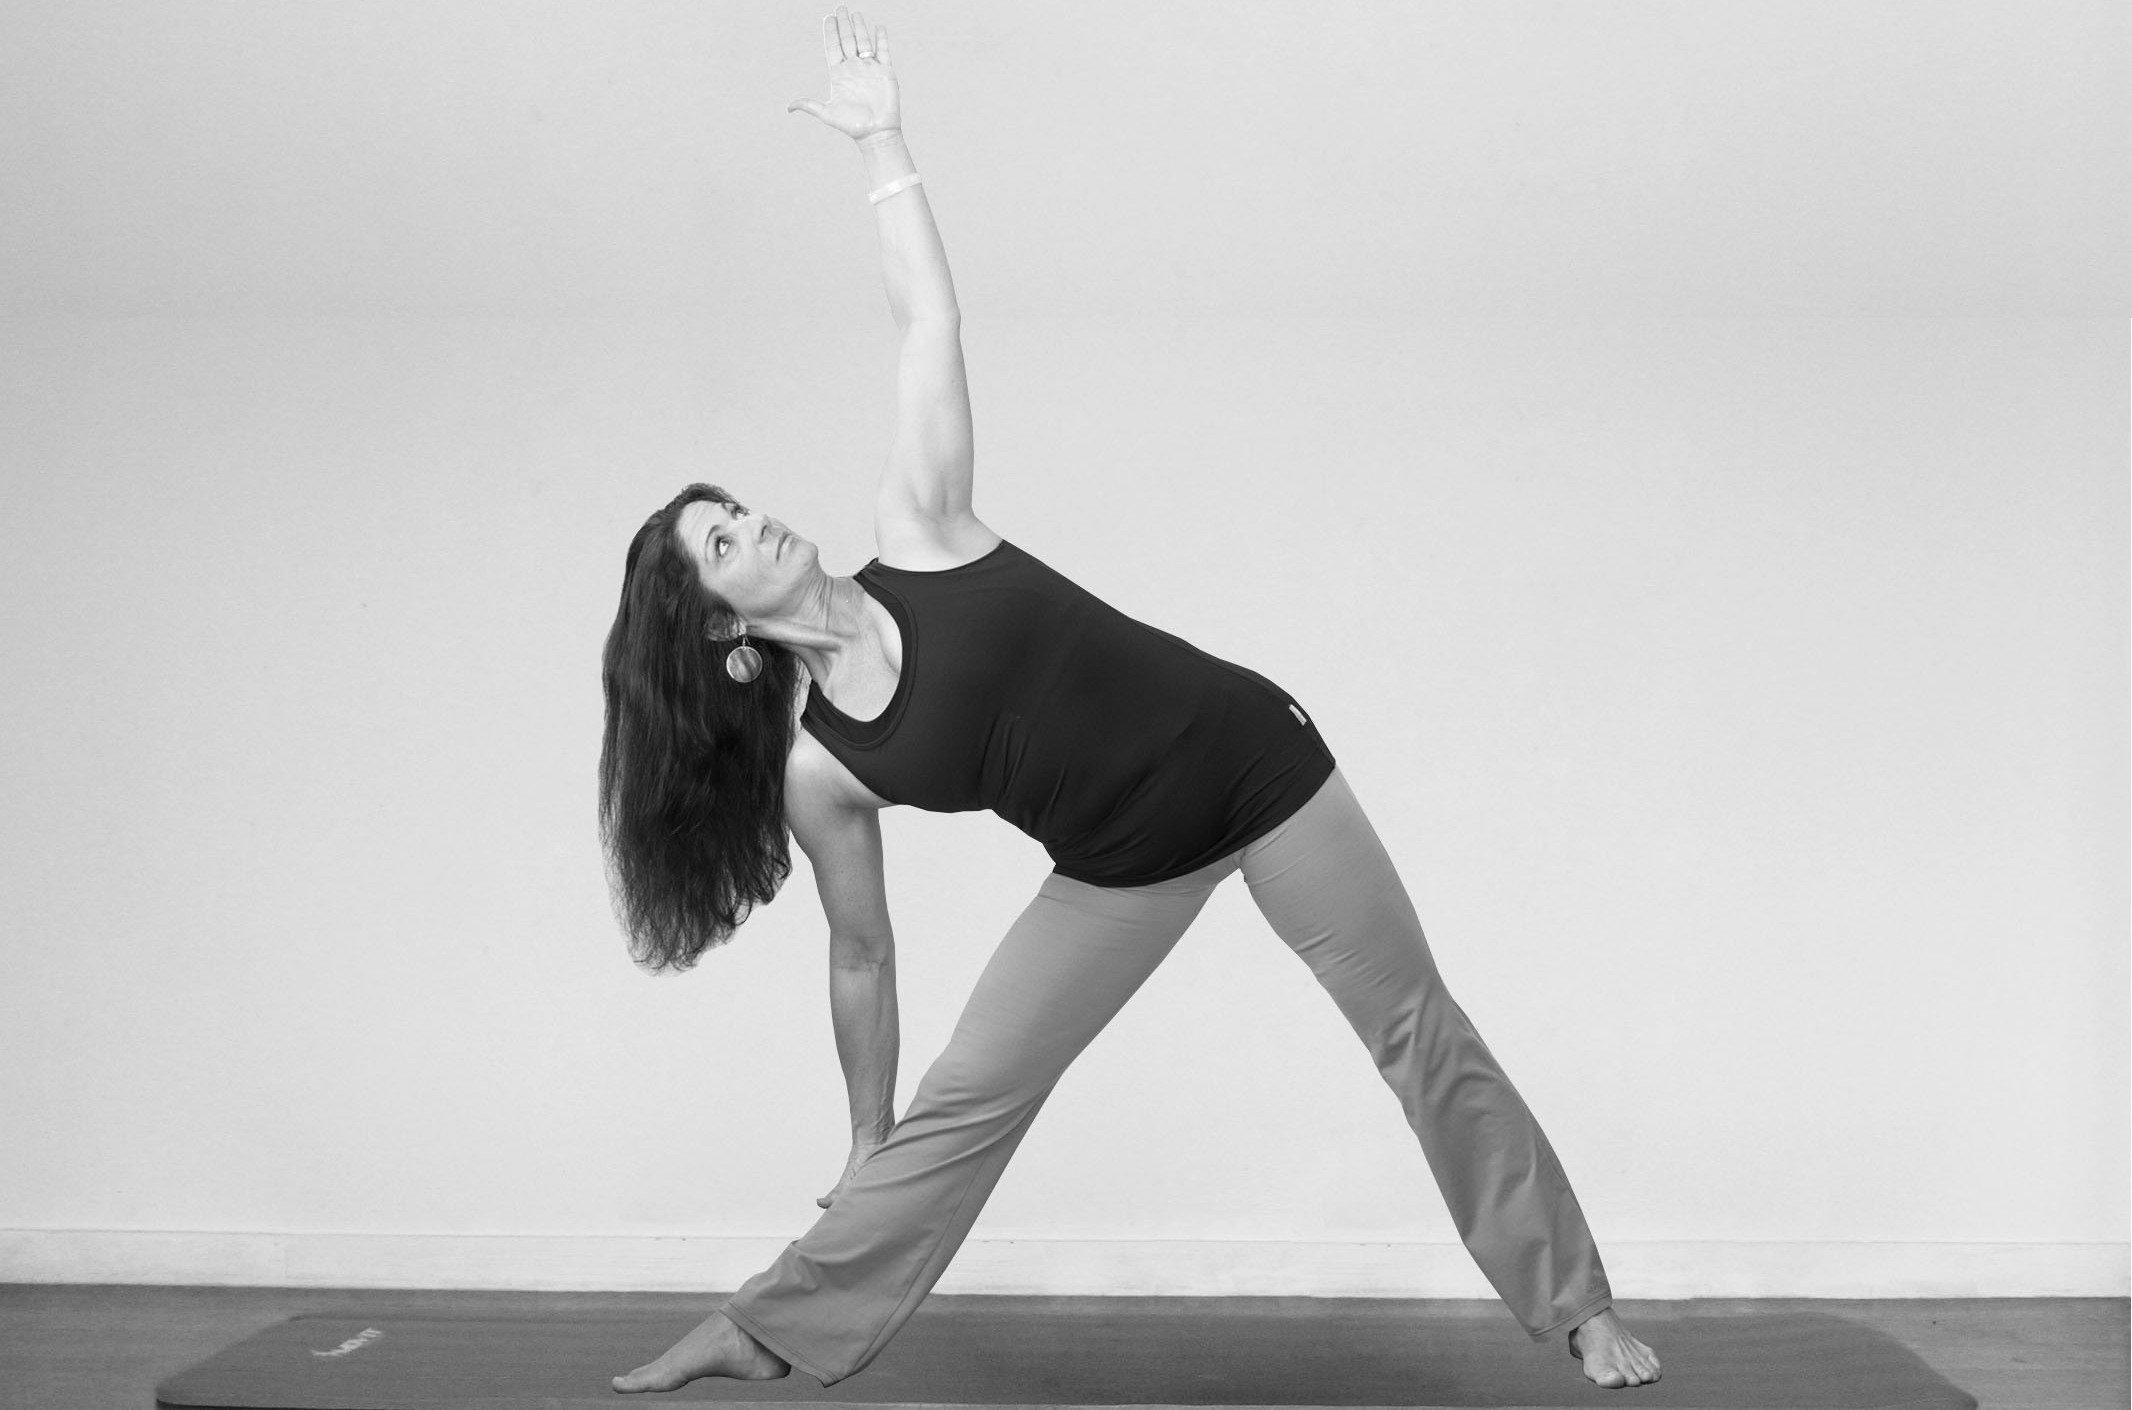 Yoga Kurse Yogakurse Vinyasa Yoga Fitness Sport Wörthsee Starnberg